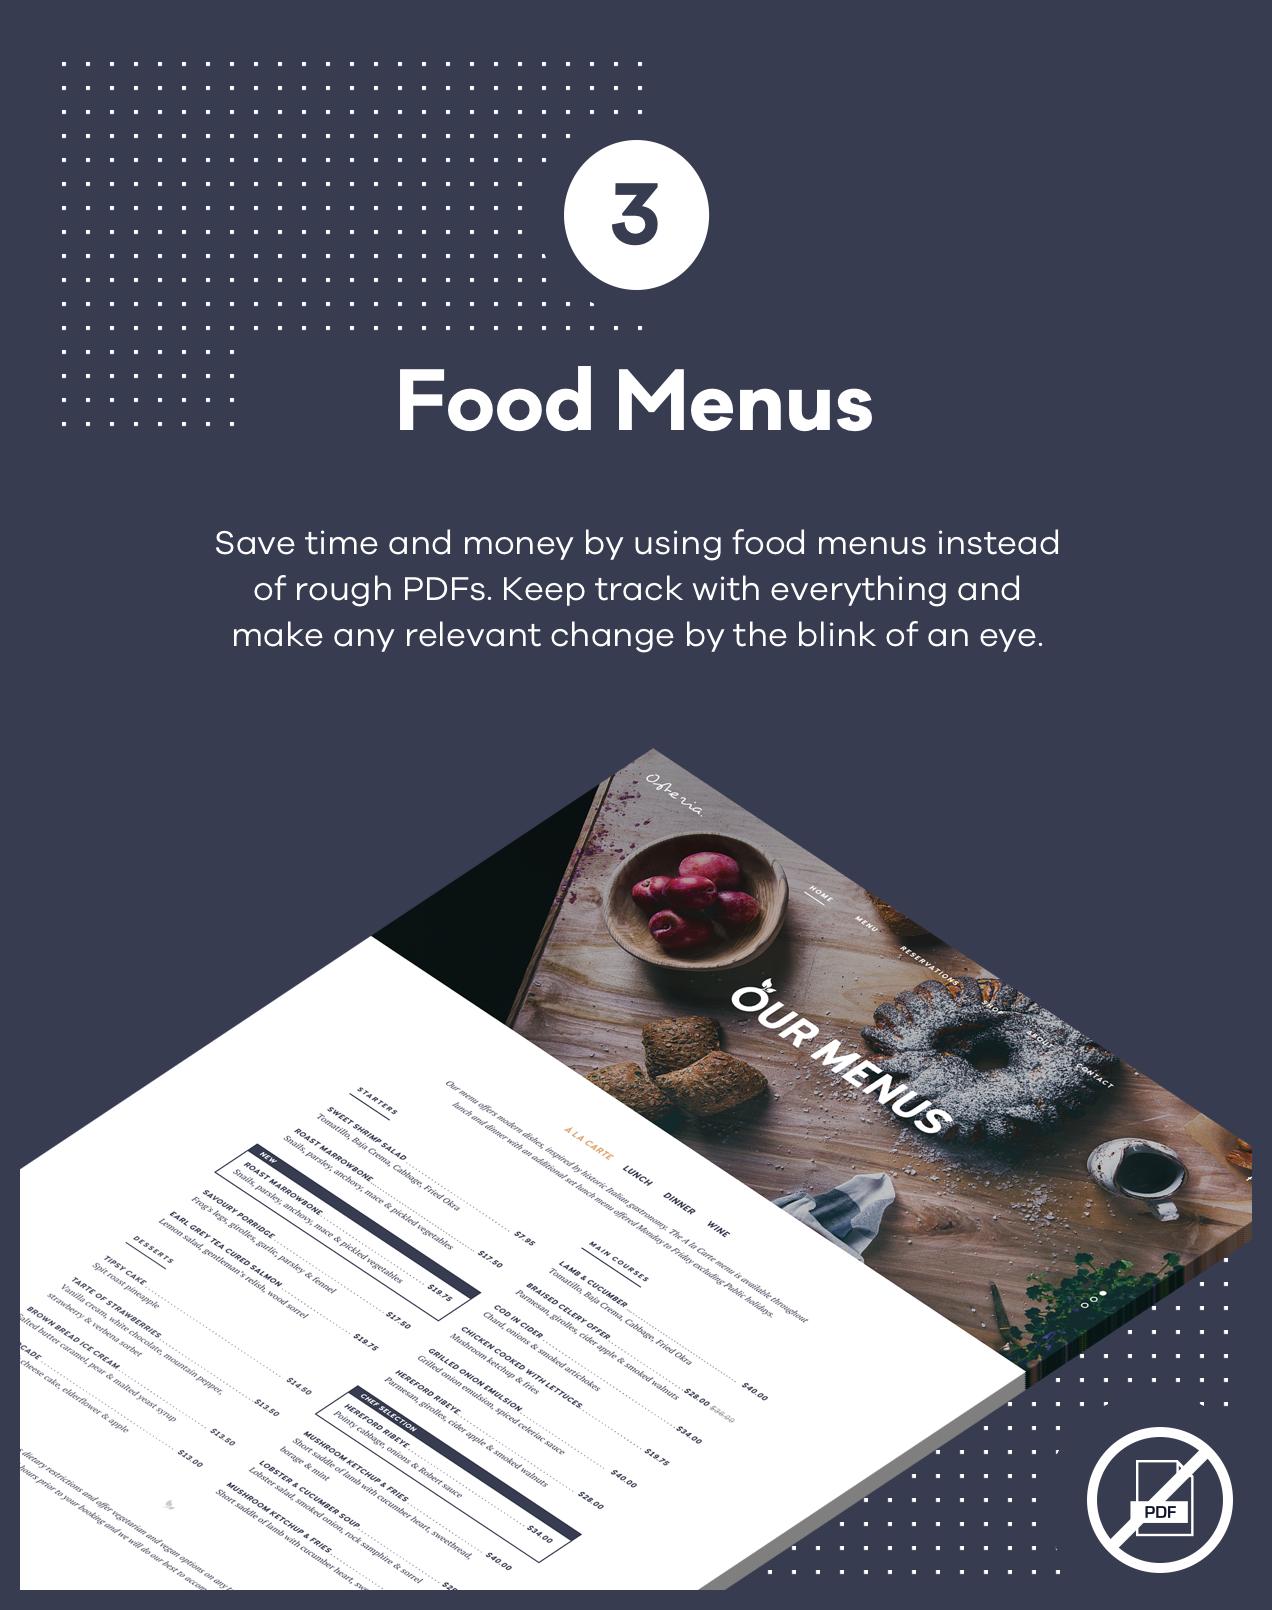 Osteria - An Engaging Restaurant WordPress Theme - 4